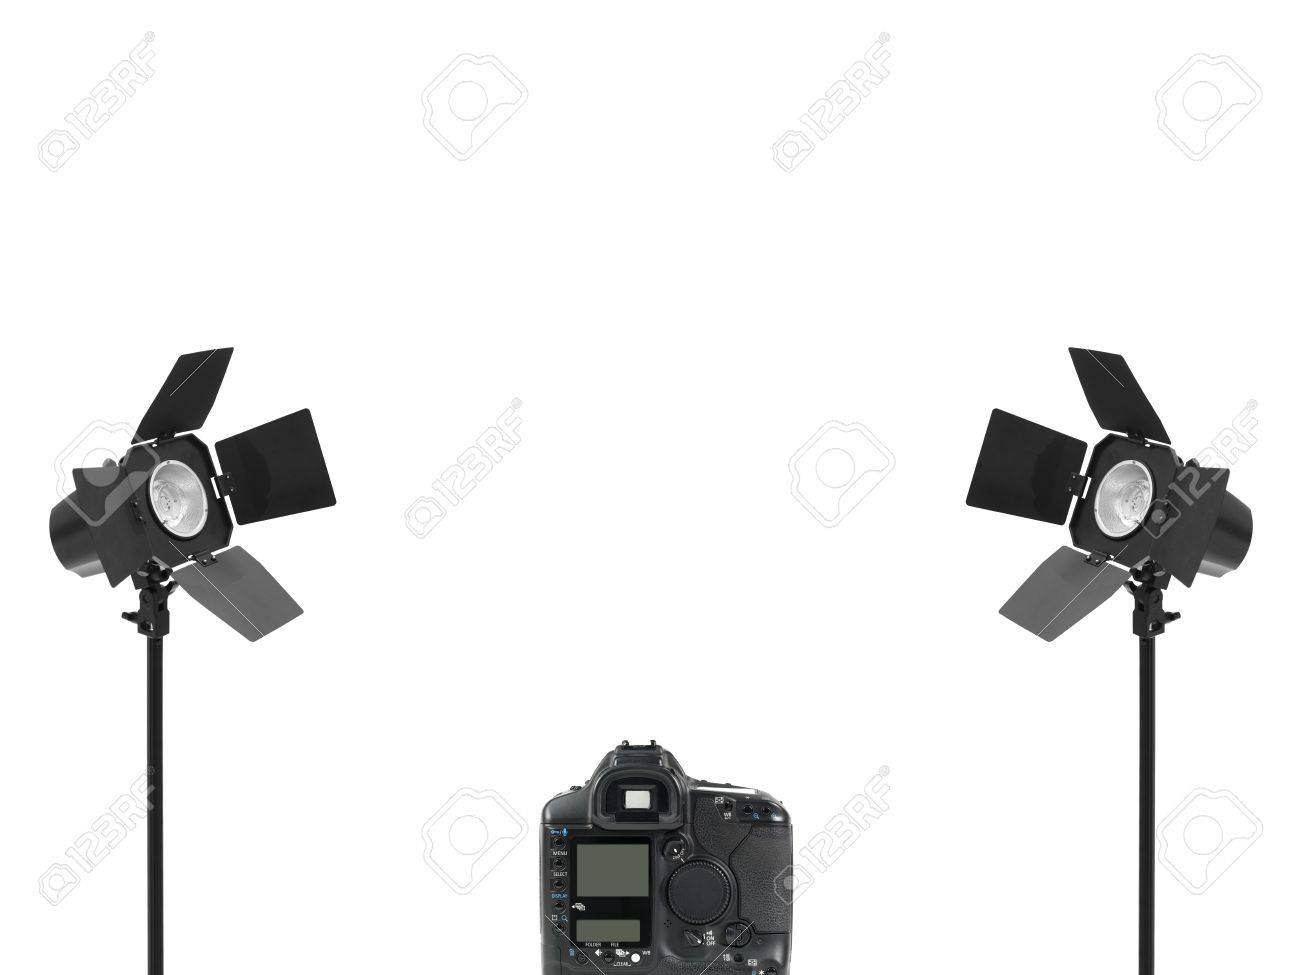 Stock Photo - Studio lighting equipment isolated against a white background  sc 1 st  123RF.com & Studio Lighting Equipment Isolated Against A White Background Stock ...